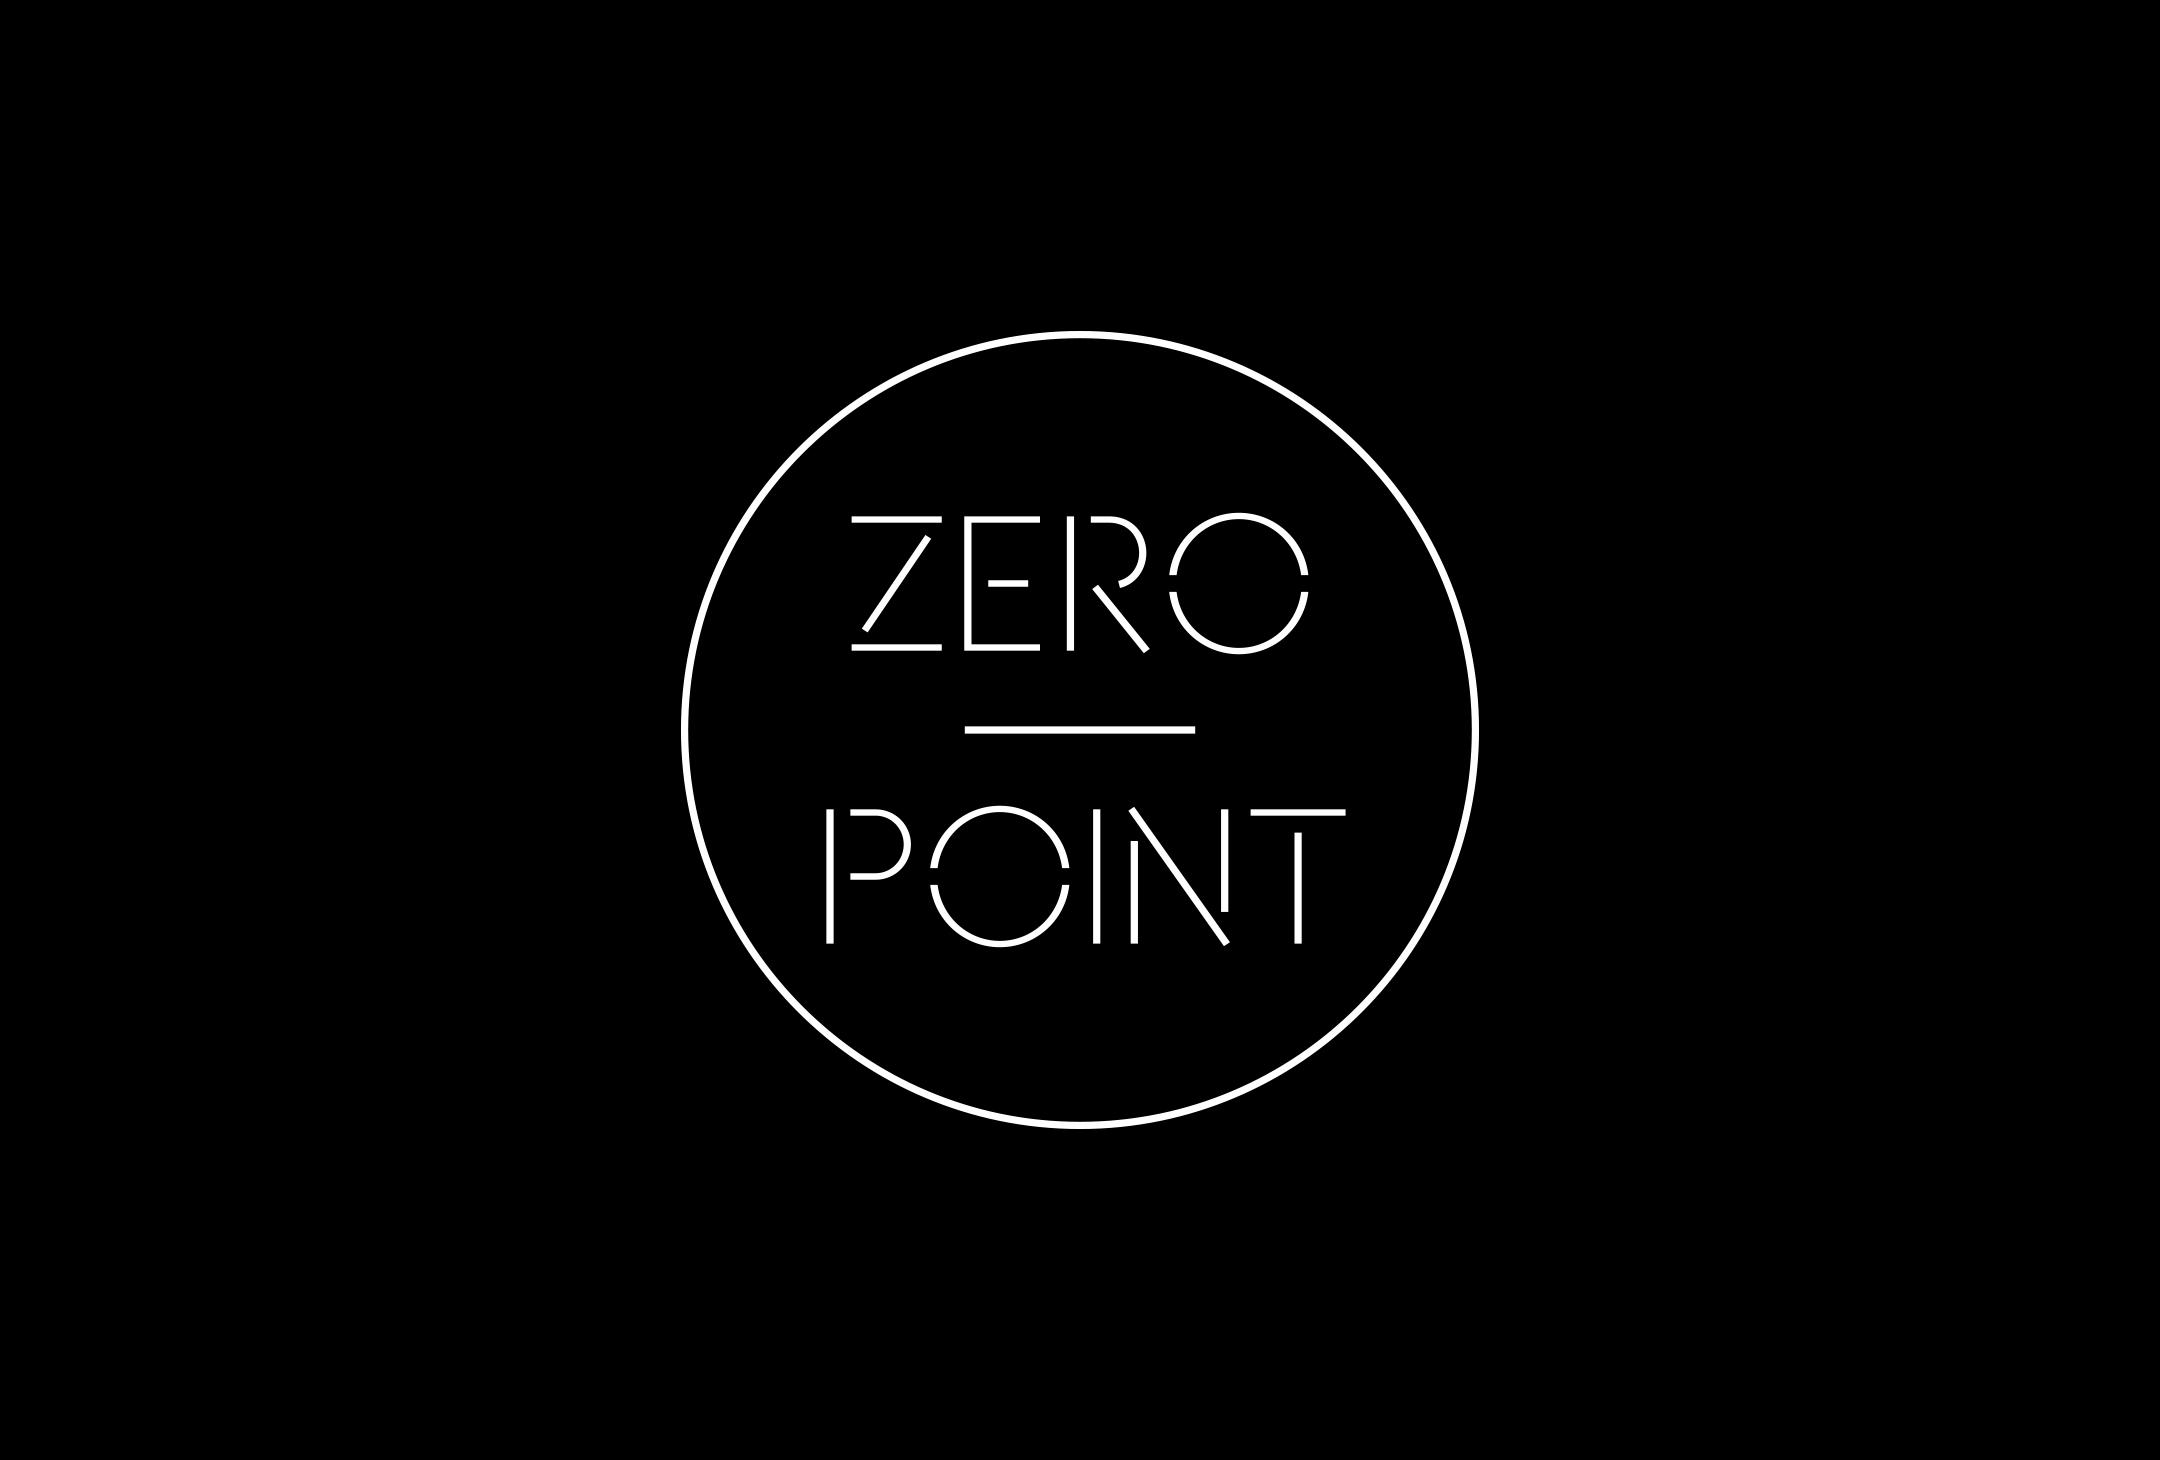 Zero Point_Logo_1080x730@2x